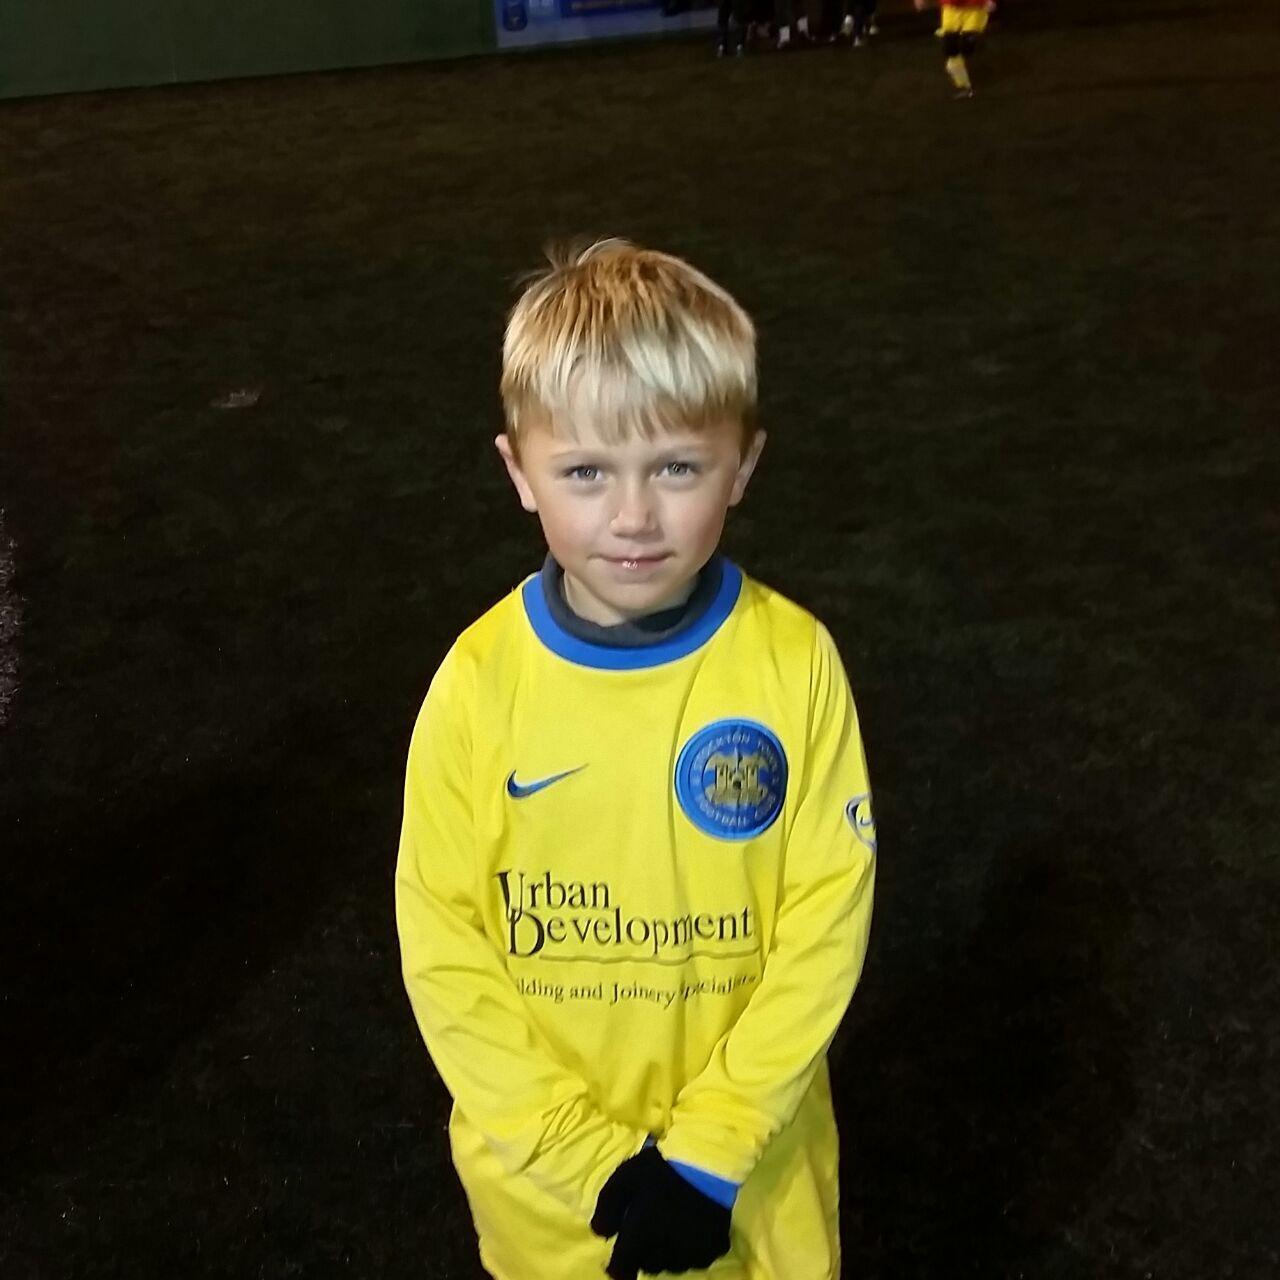 Bobby Johnson Tony's son who has scored 5 goals in 2 games.